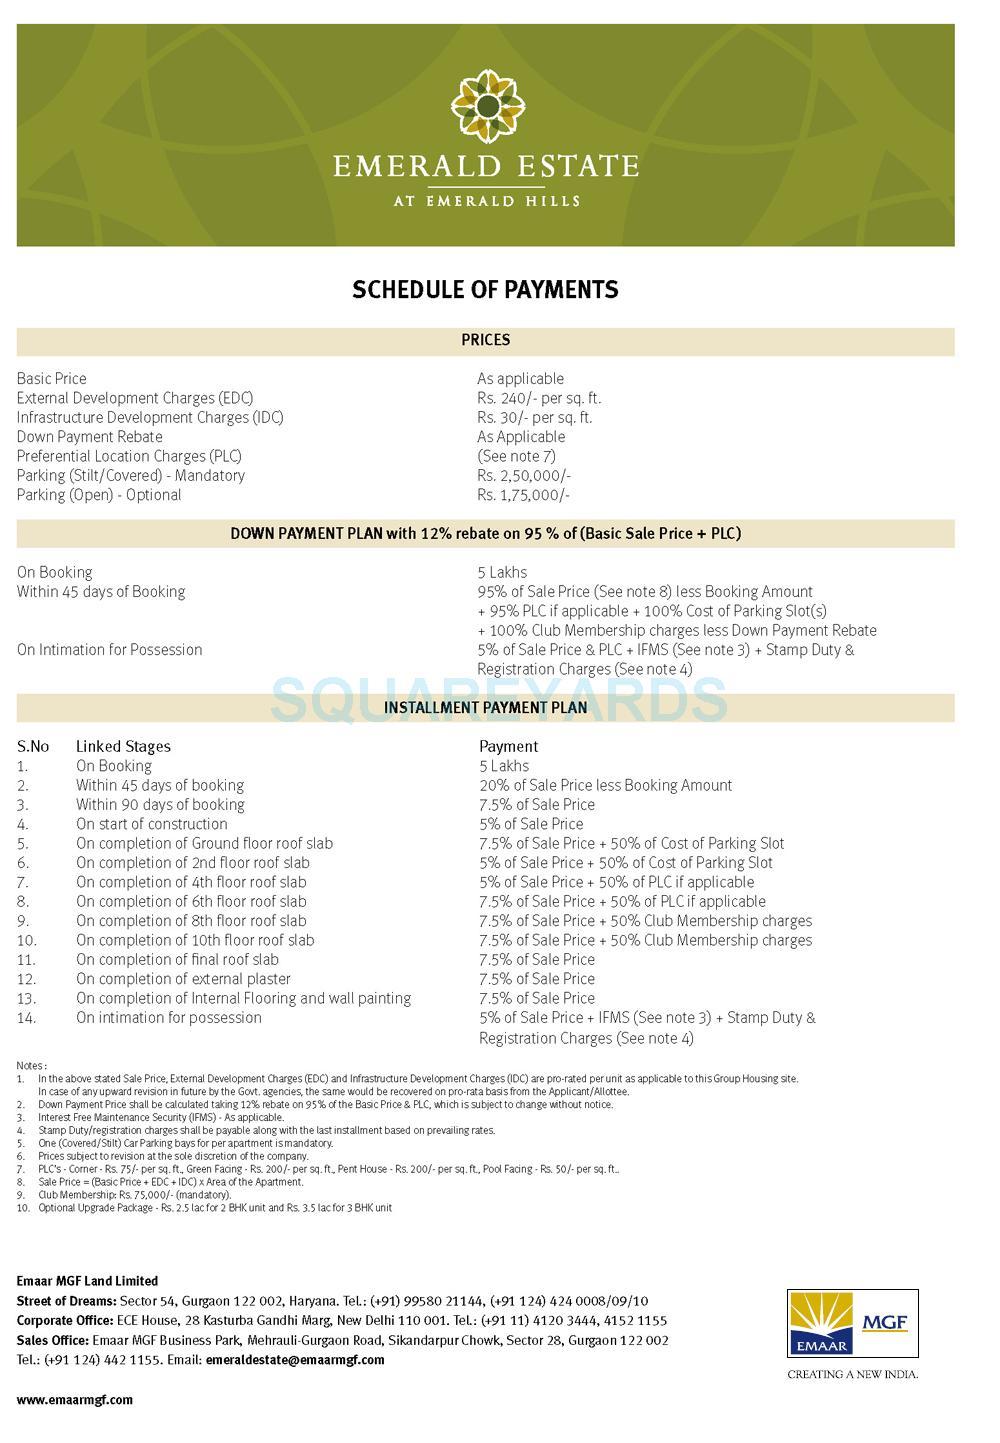 emmar mgf emerald estate payment plan image1